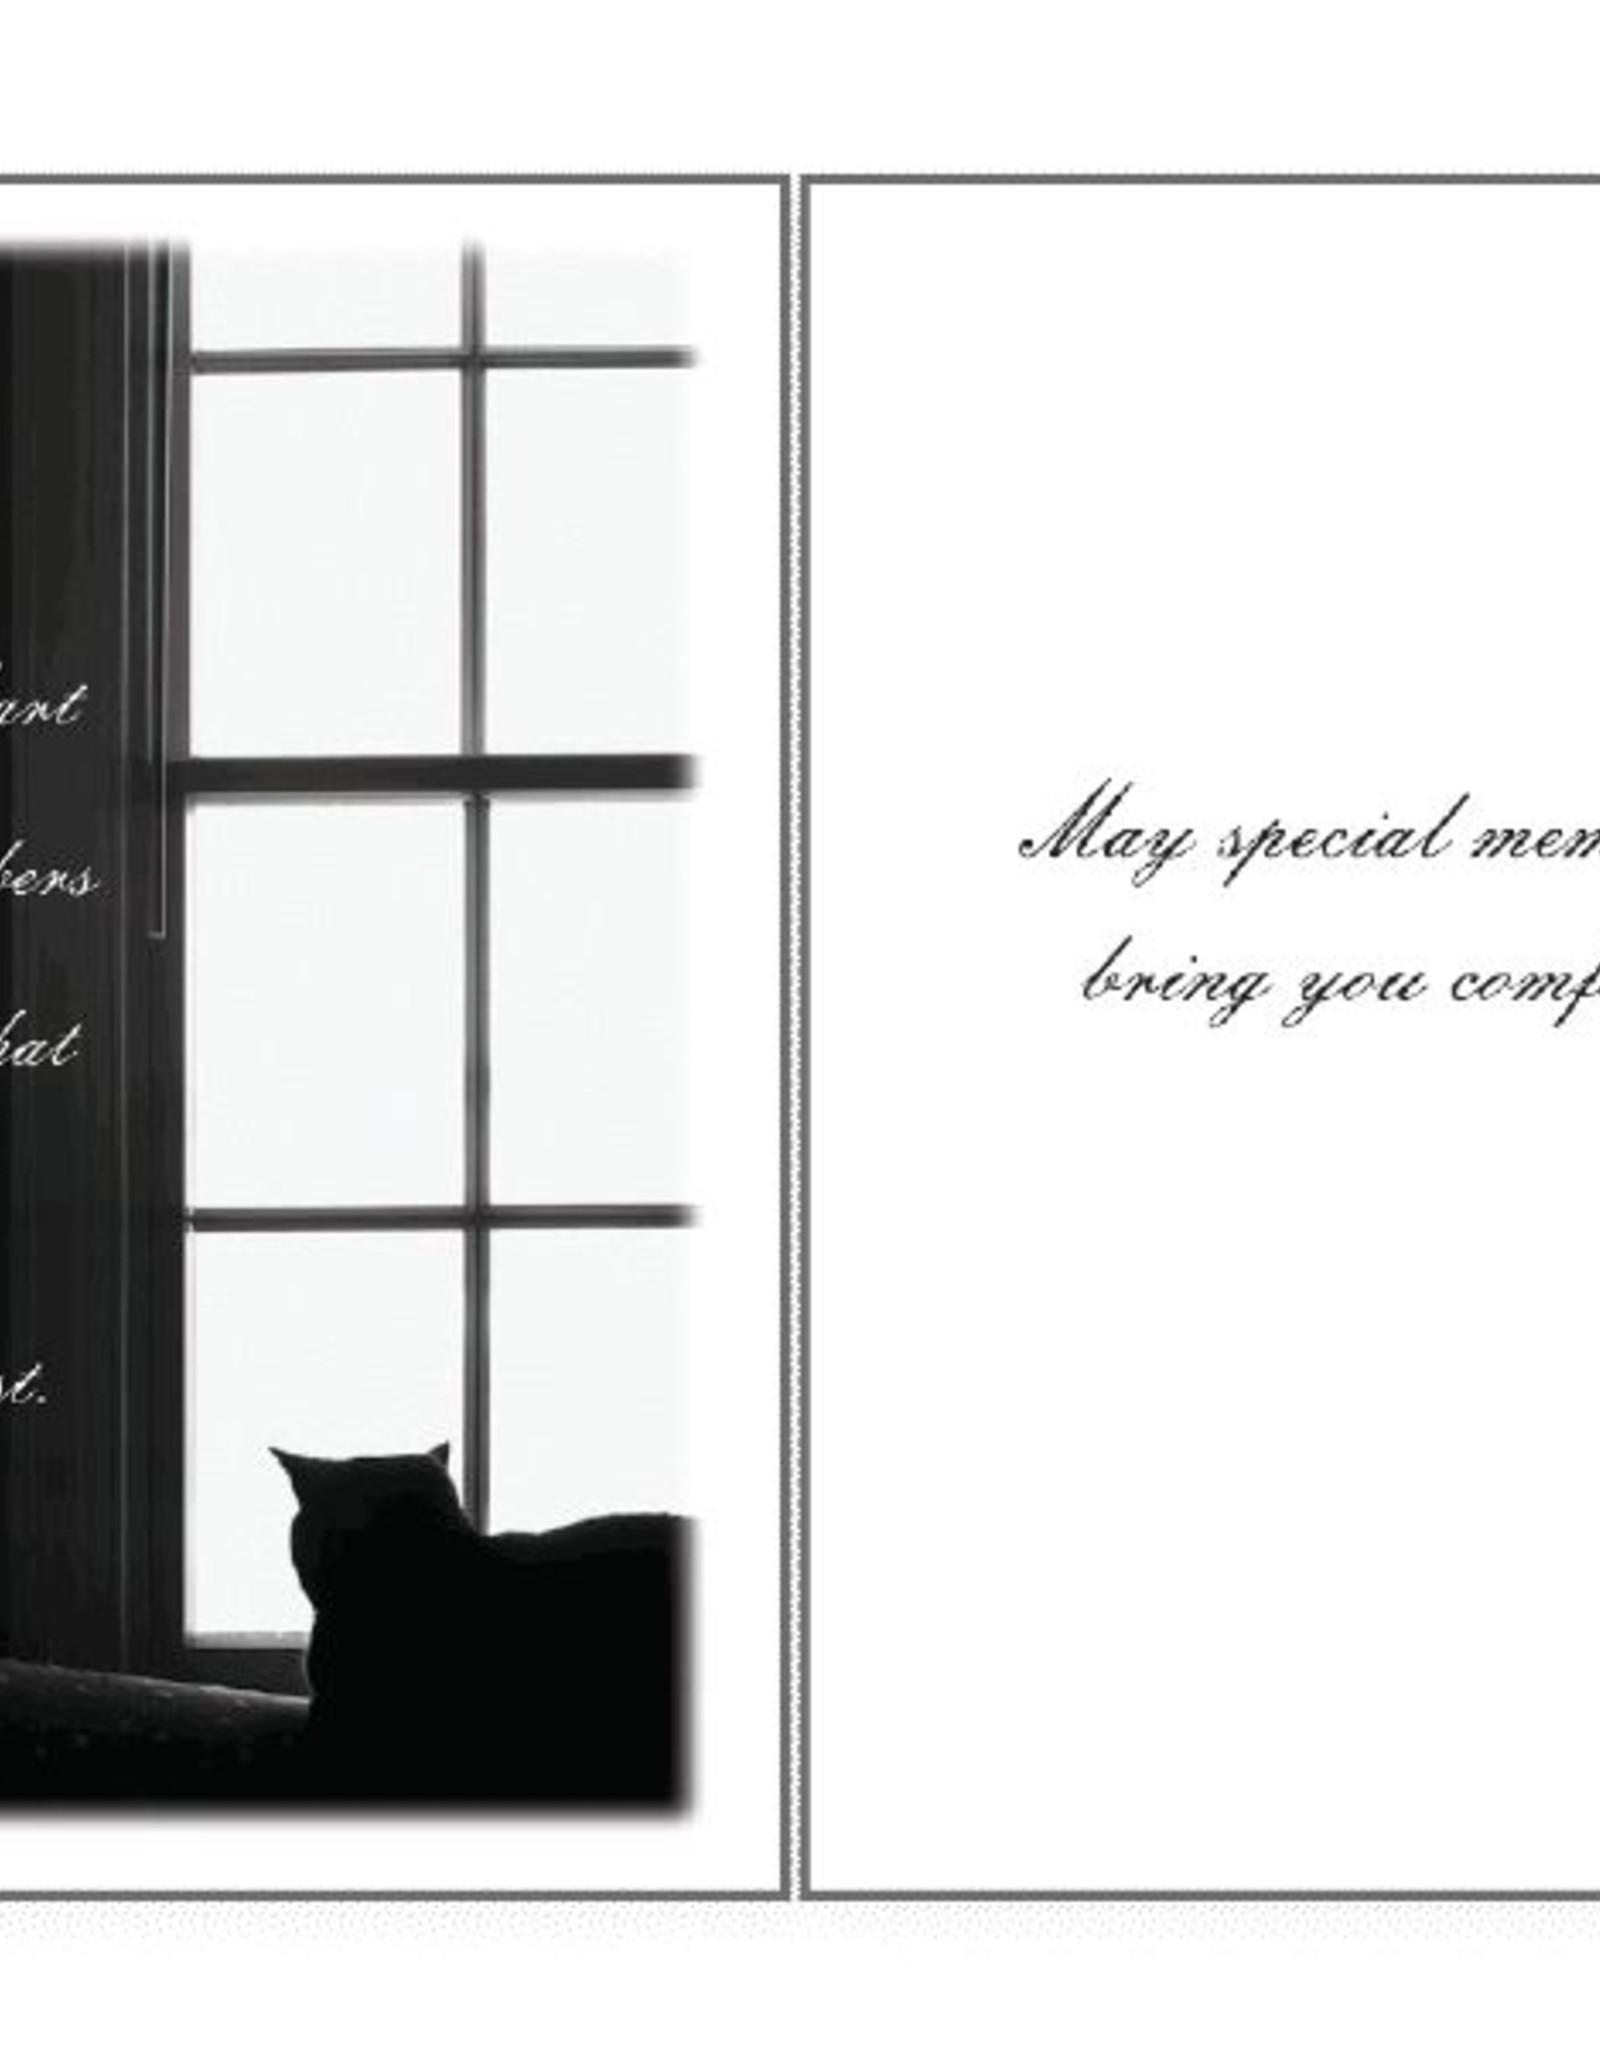 Dog Speak Dog Speak Card - Sympathy Cat- The Heart Remembers